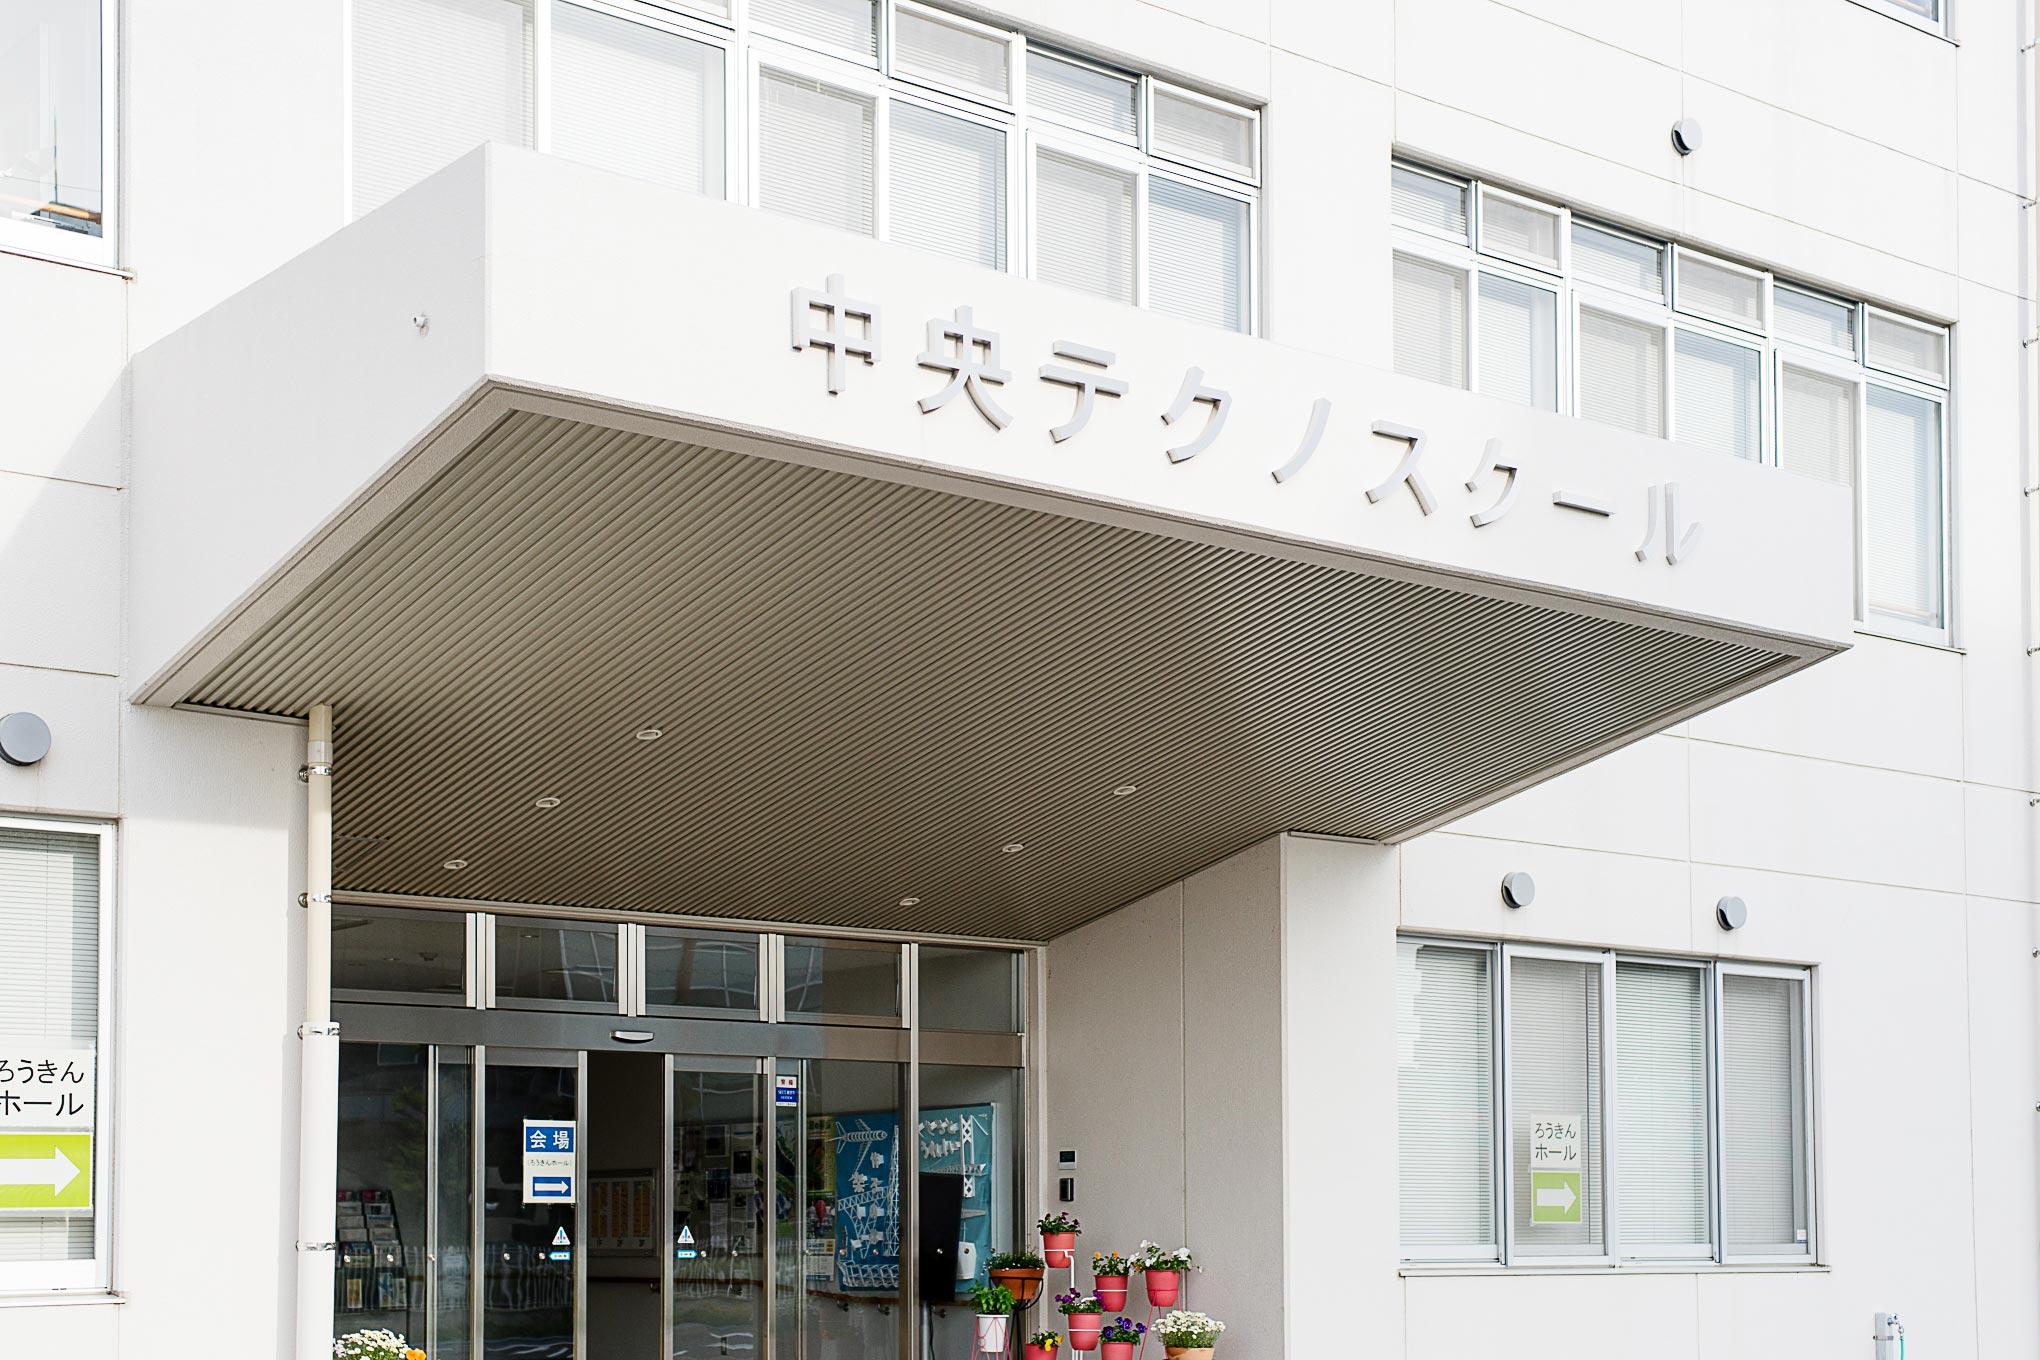 kamiyama-magewappa_20160426-1